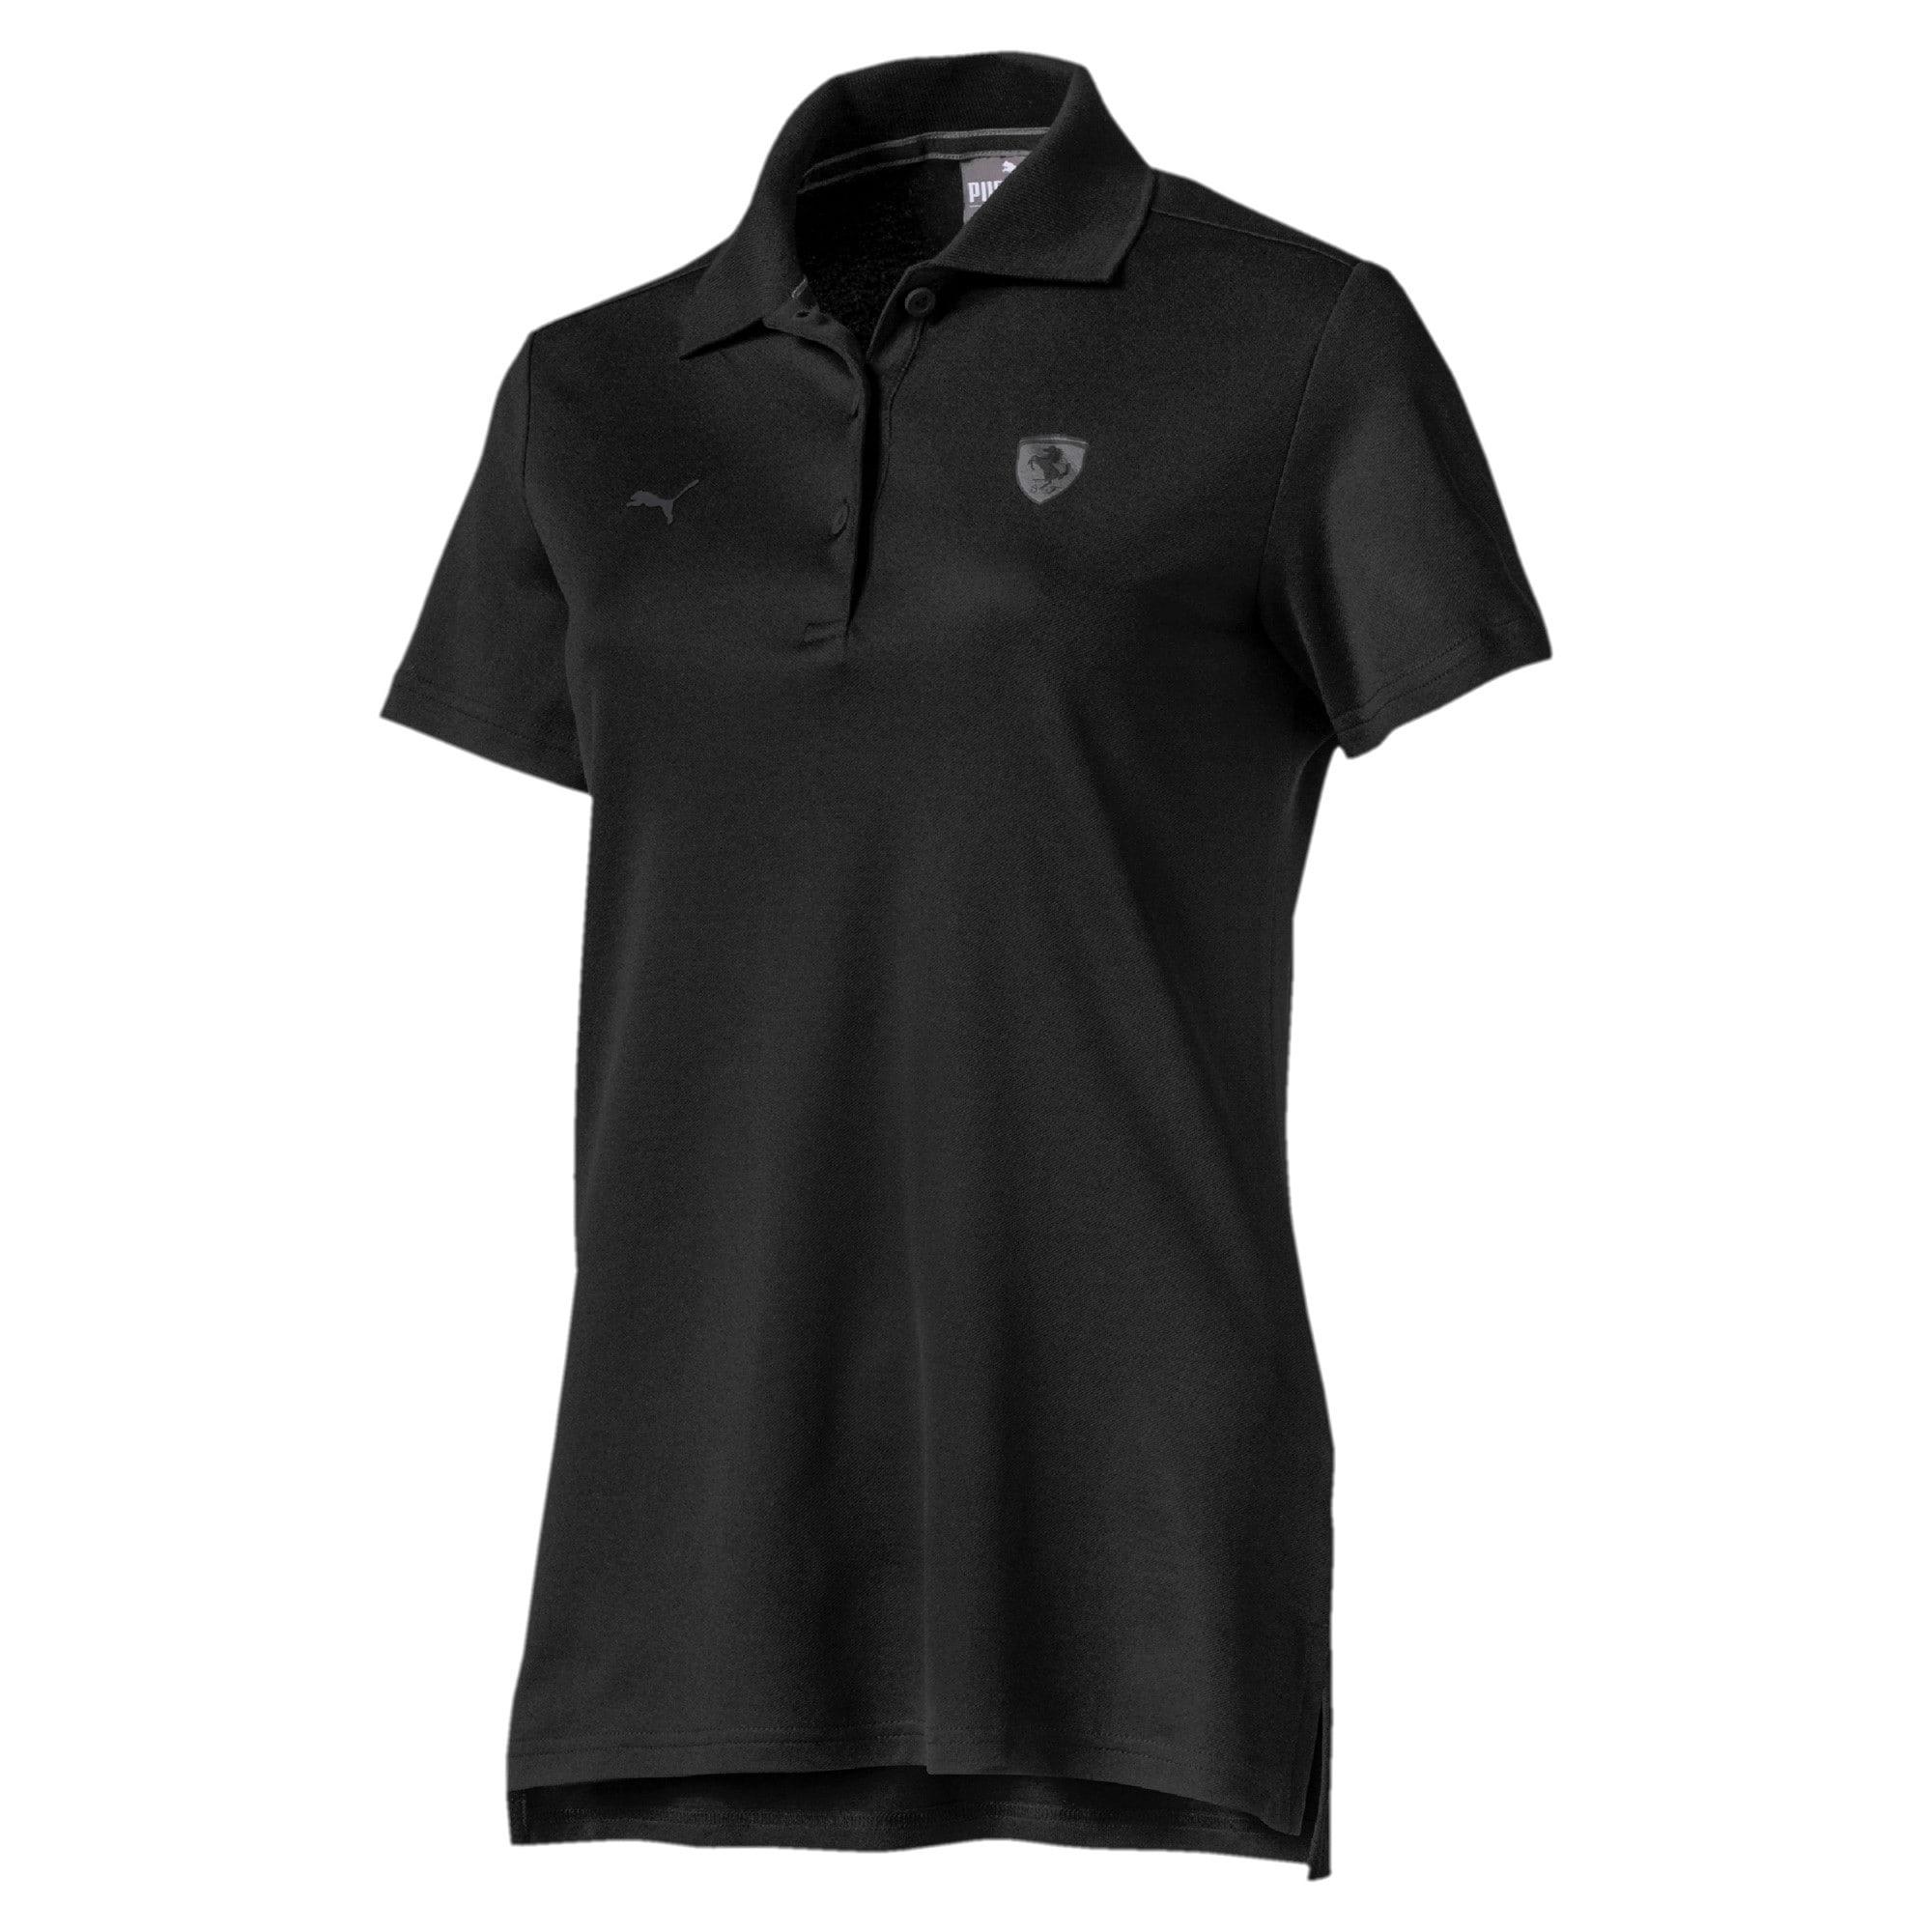 Thumbnail 4 of Ferrari Women's Polo Shirt, Puma Black, medium